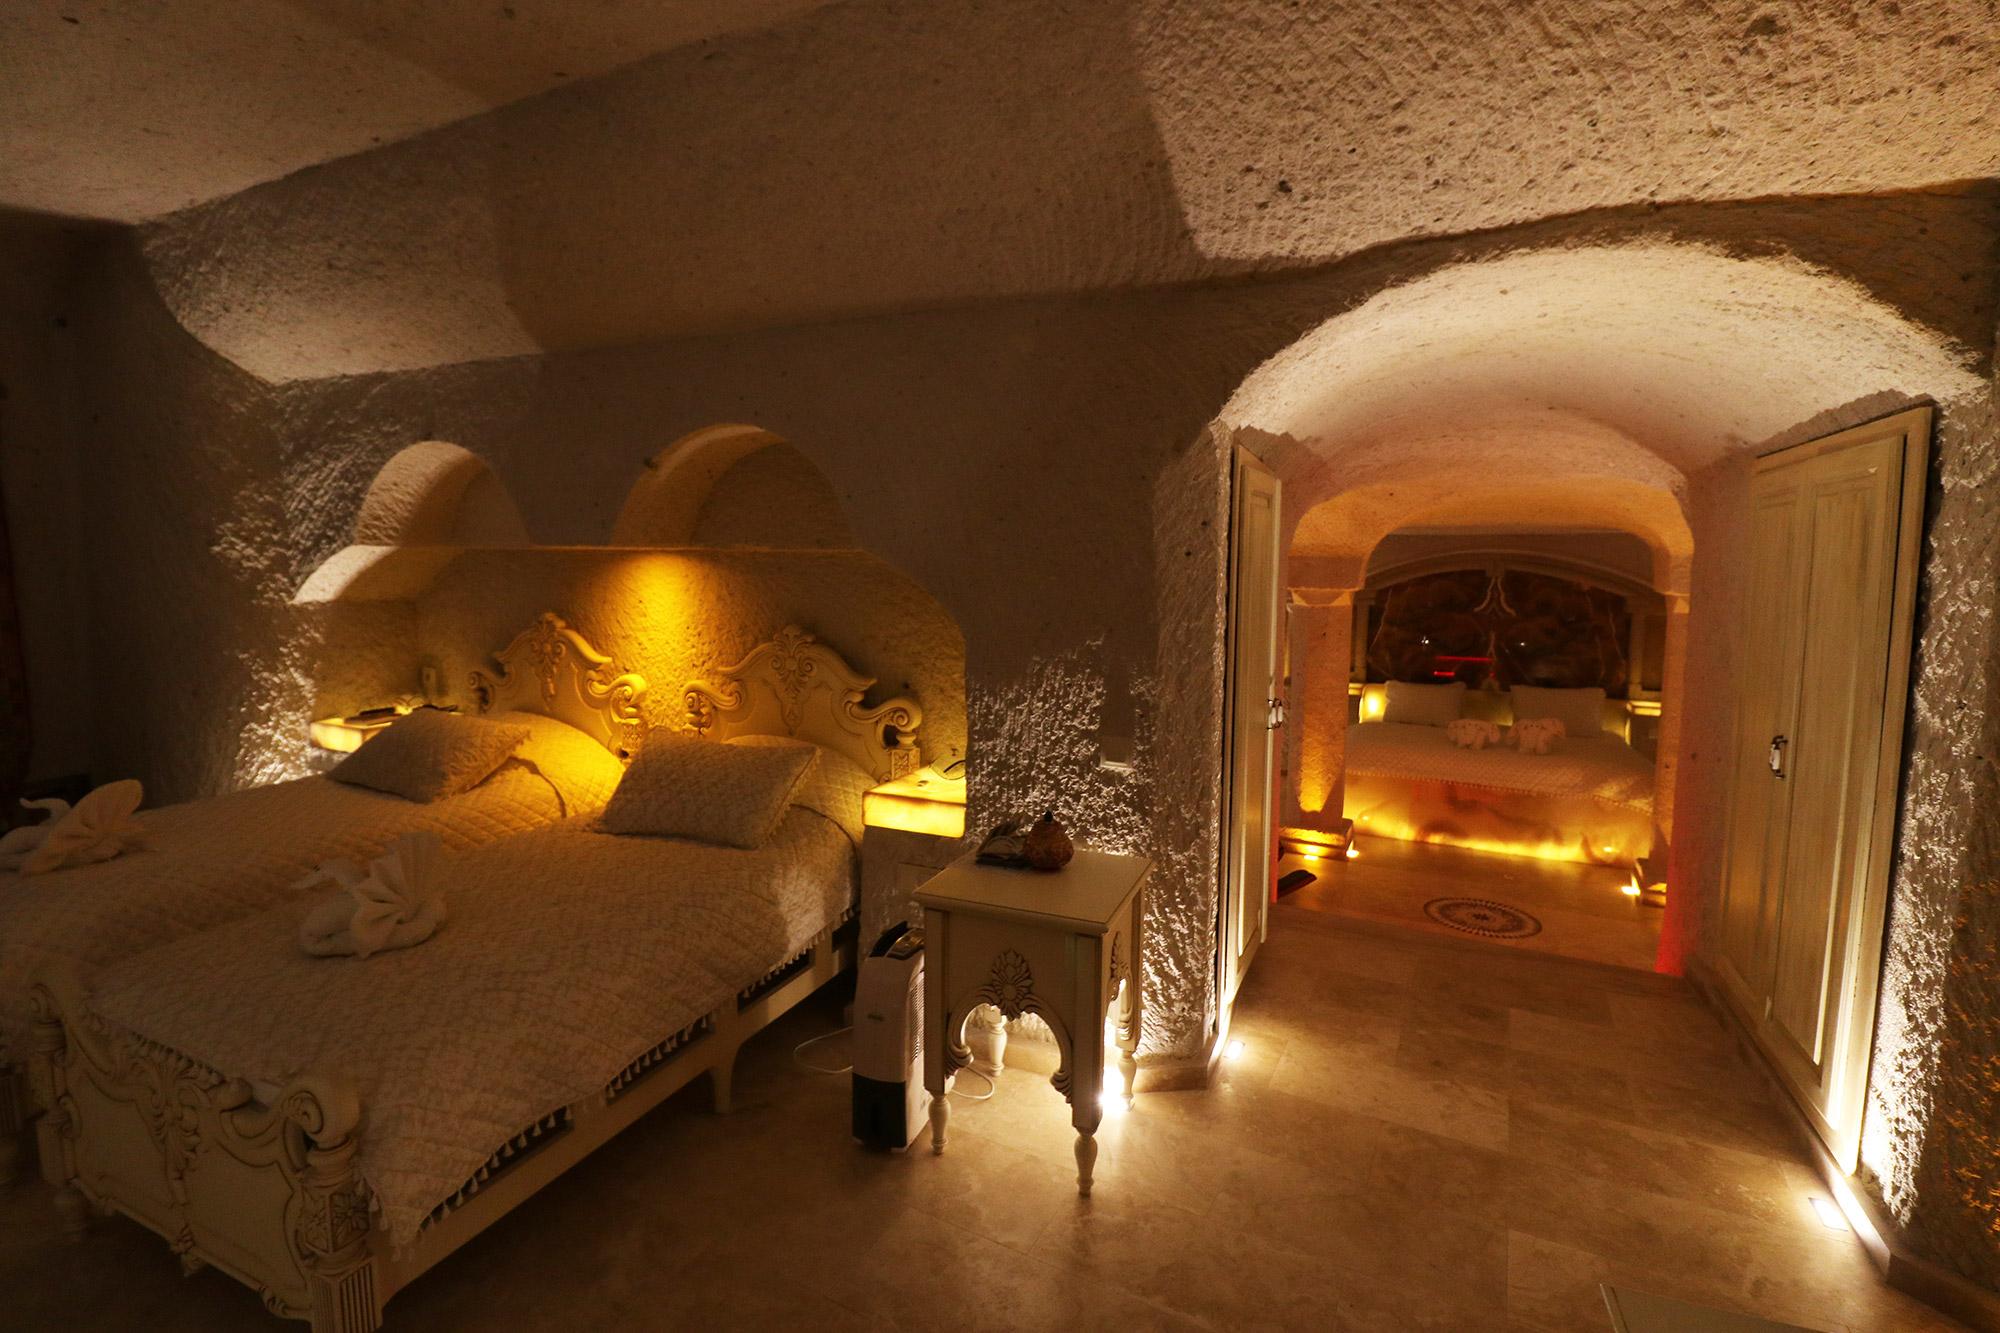 Turkije reisverslag: Terug in Cappadocië - Lale Saray Hotel